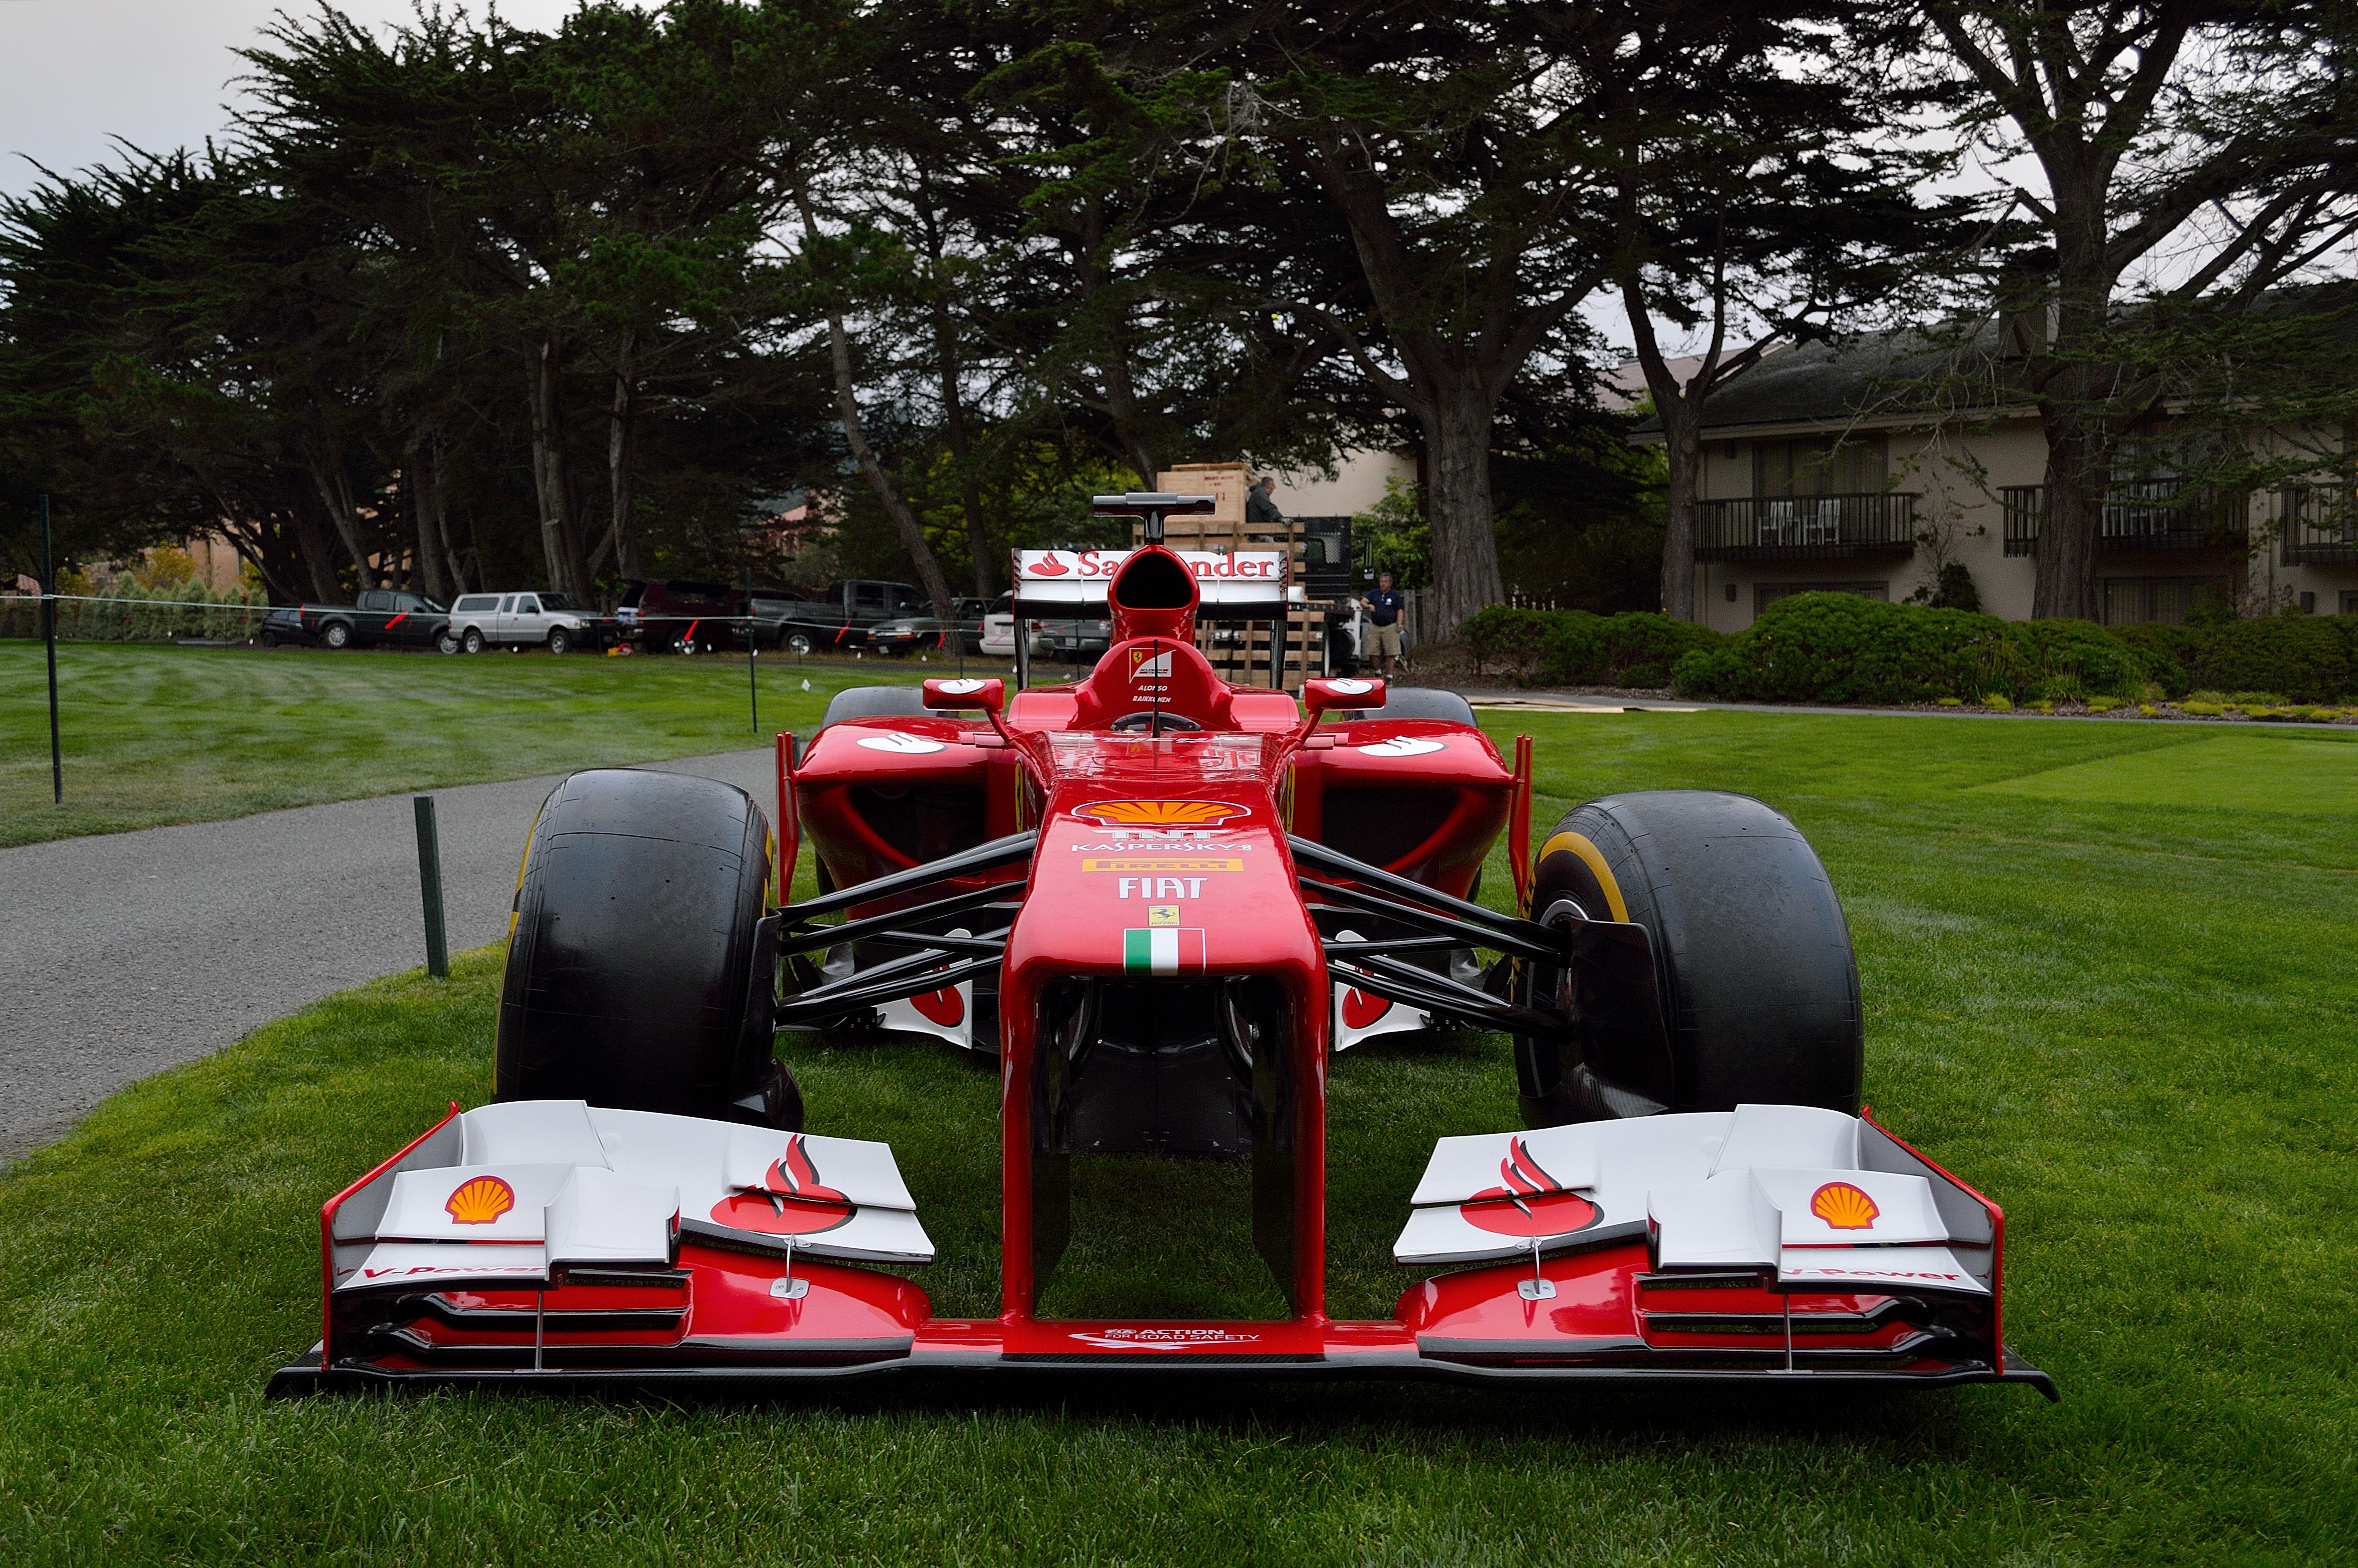 File:Ferrari F14 T fv.jpg - Wikimedia Commons